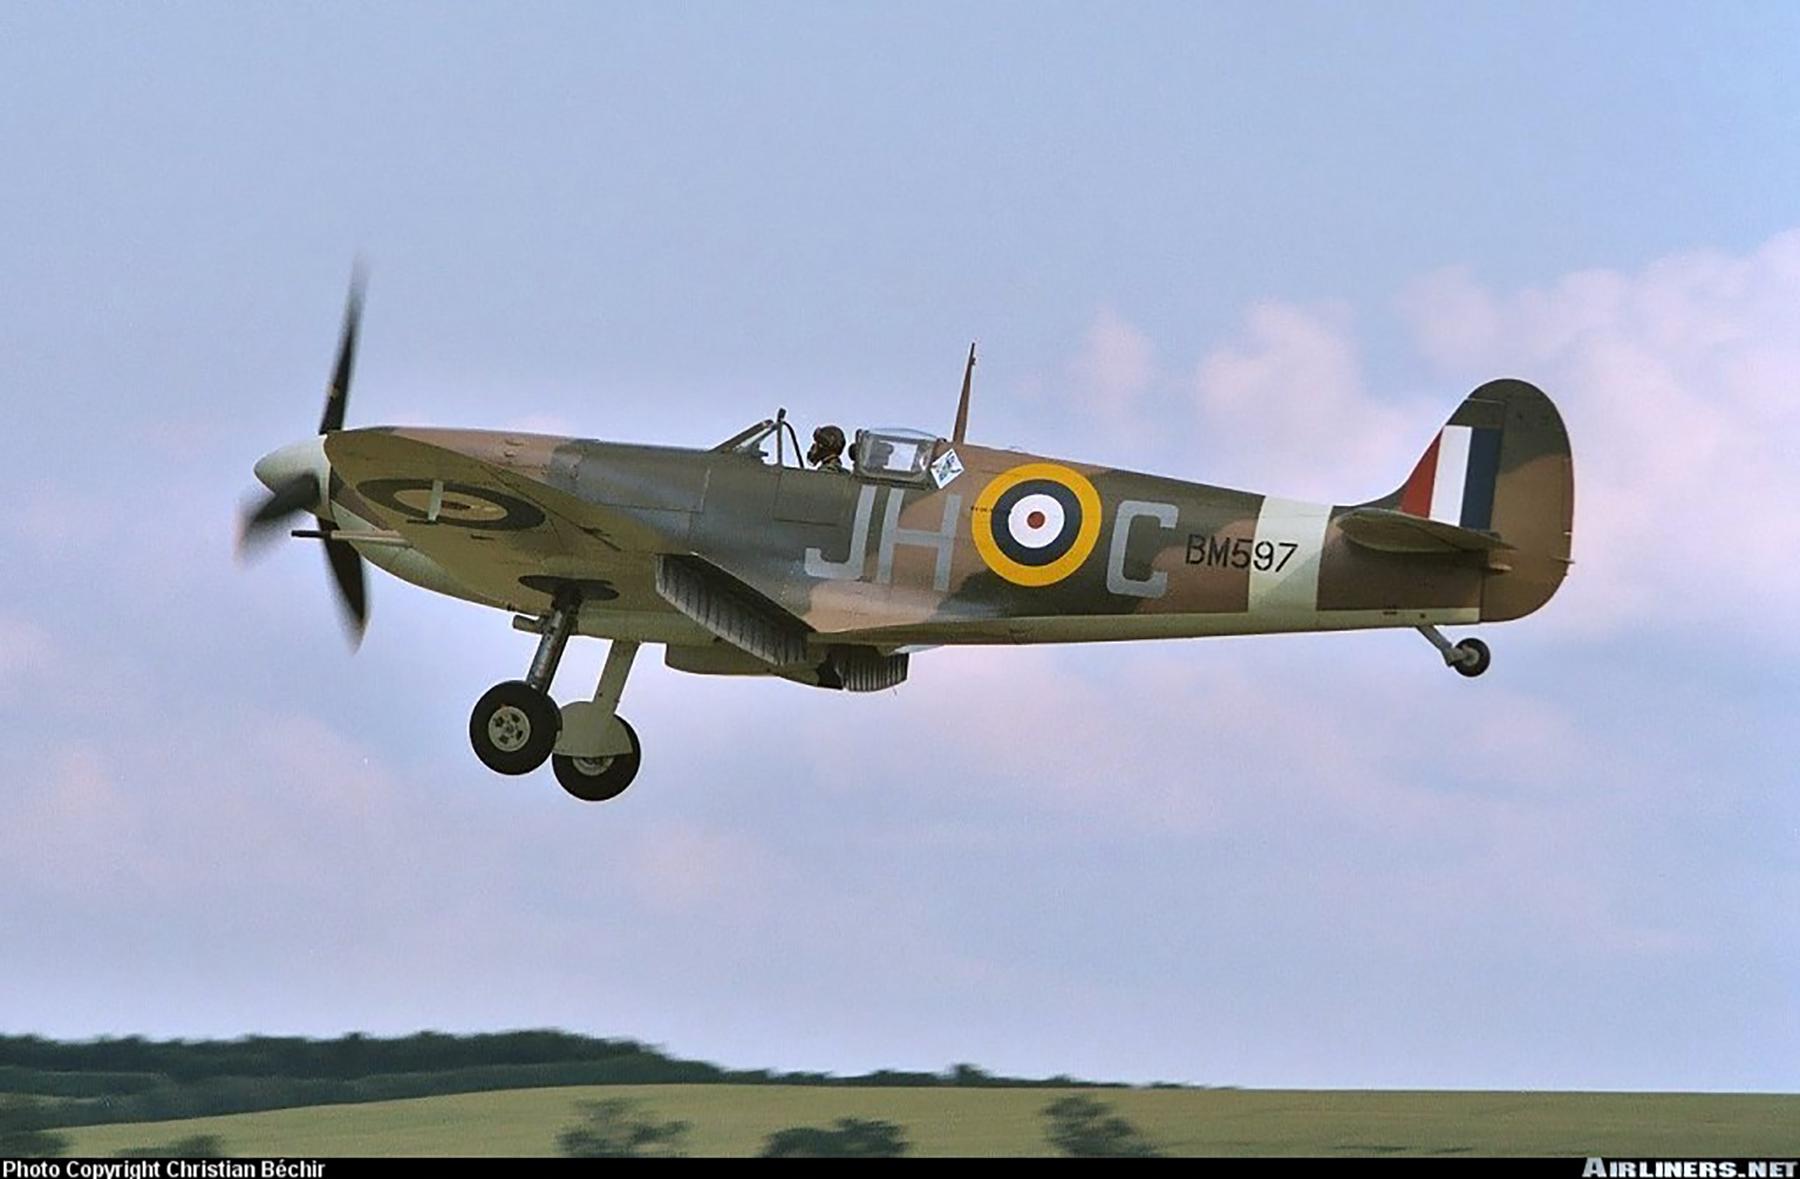 Airworthy Spitfire warbird MkVb RAF 317Sqn JHC BM597 G MKVB 11